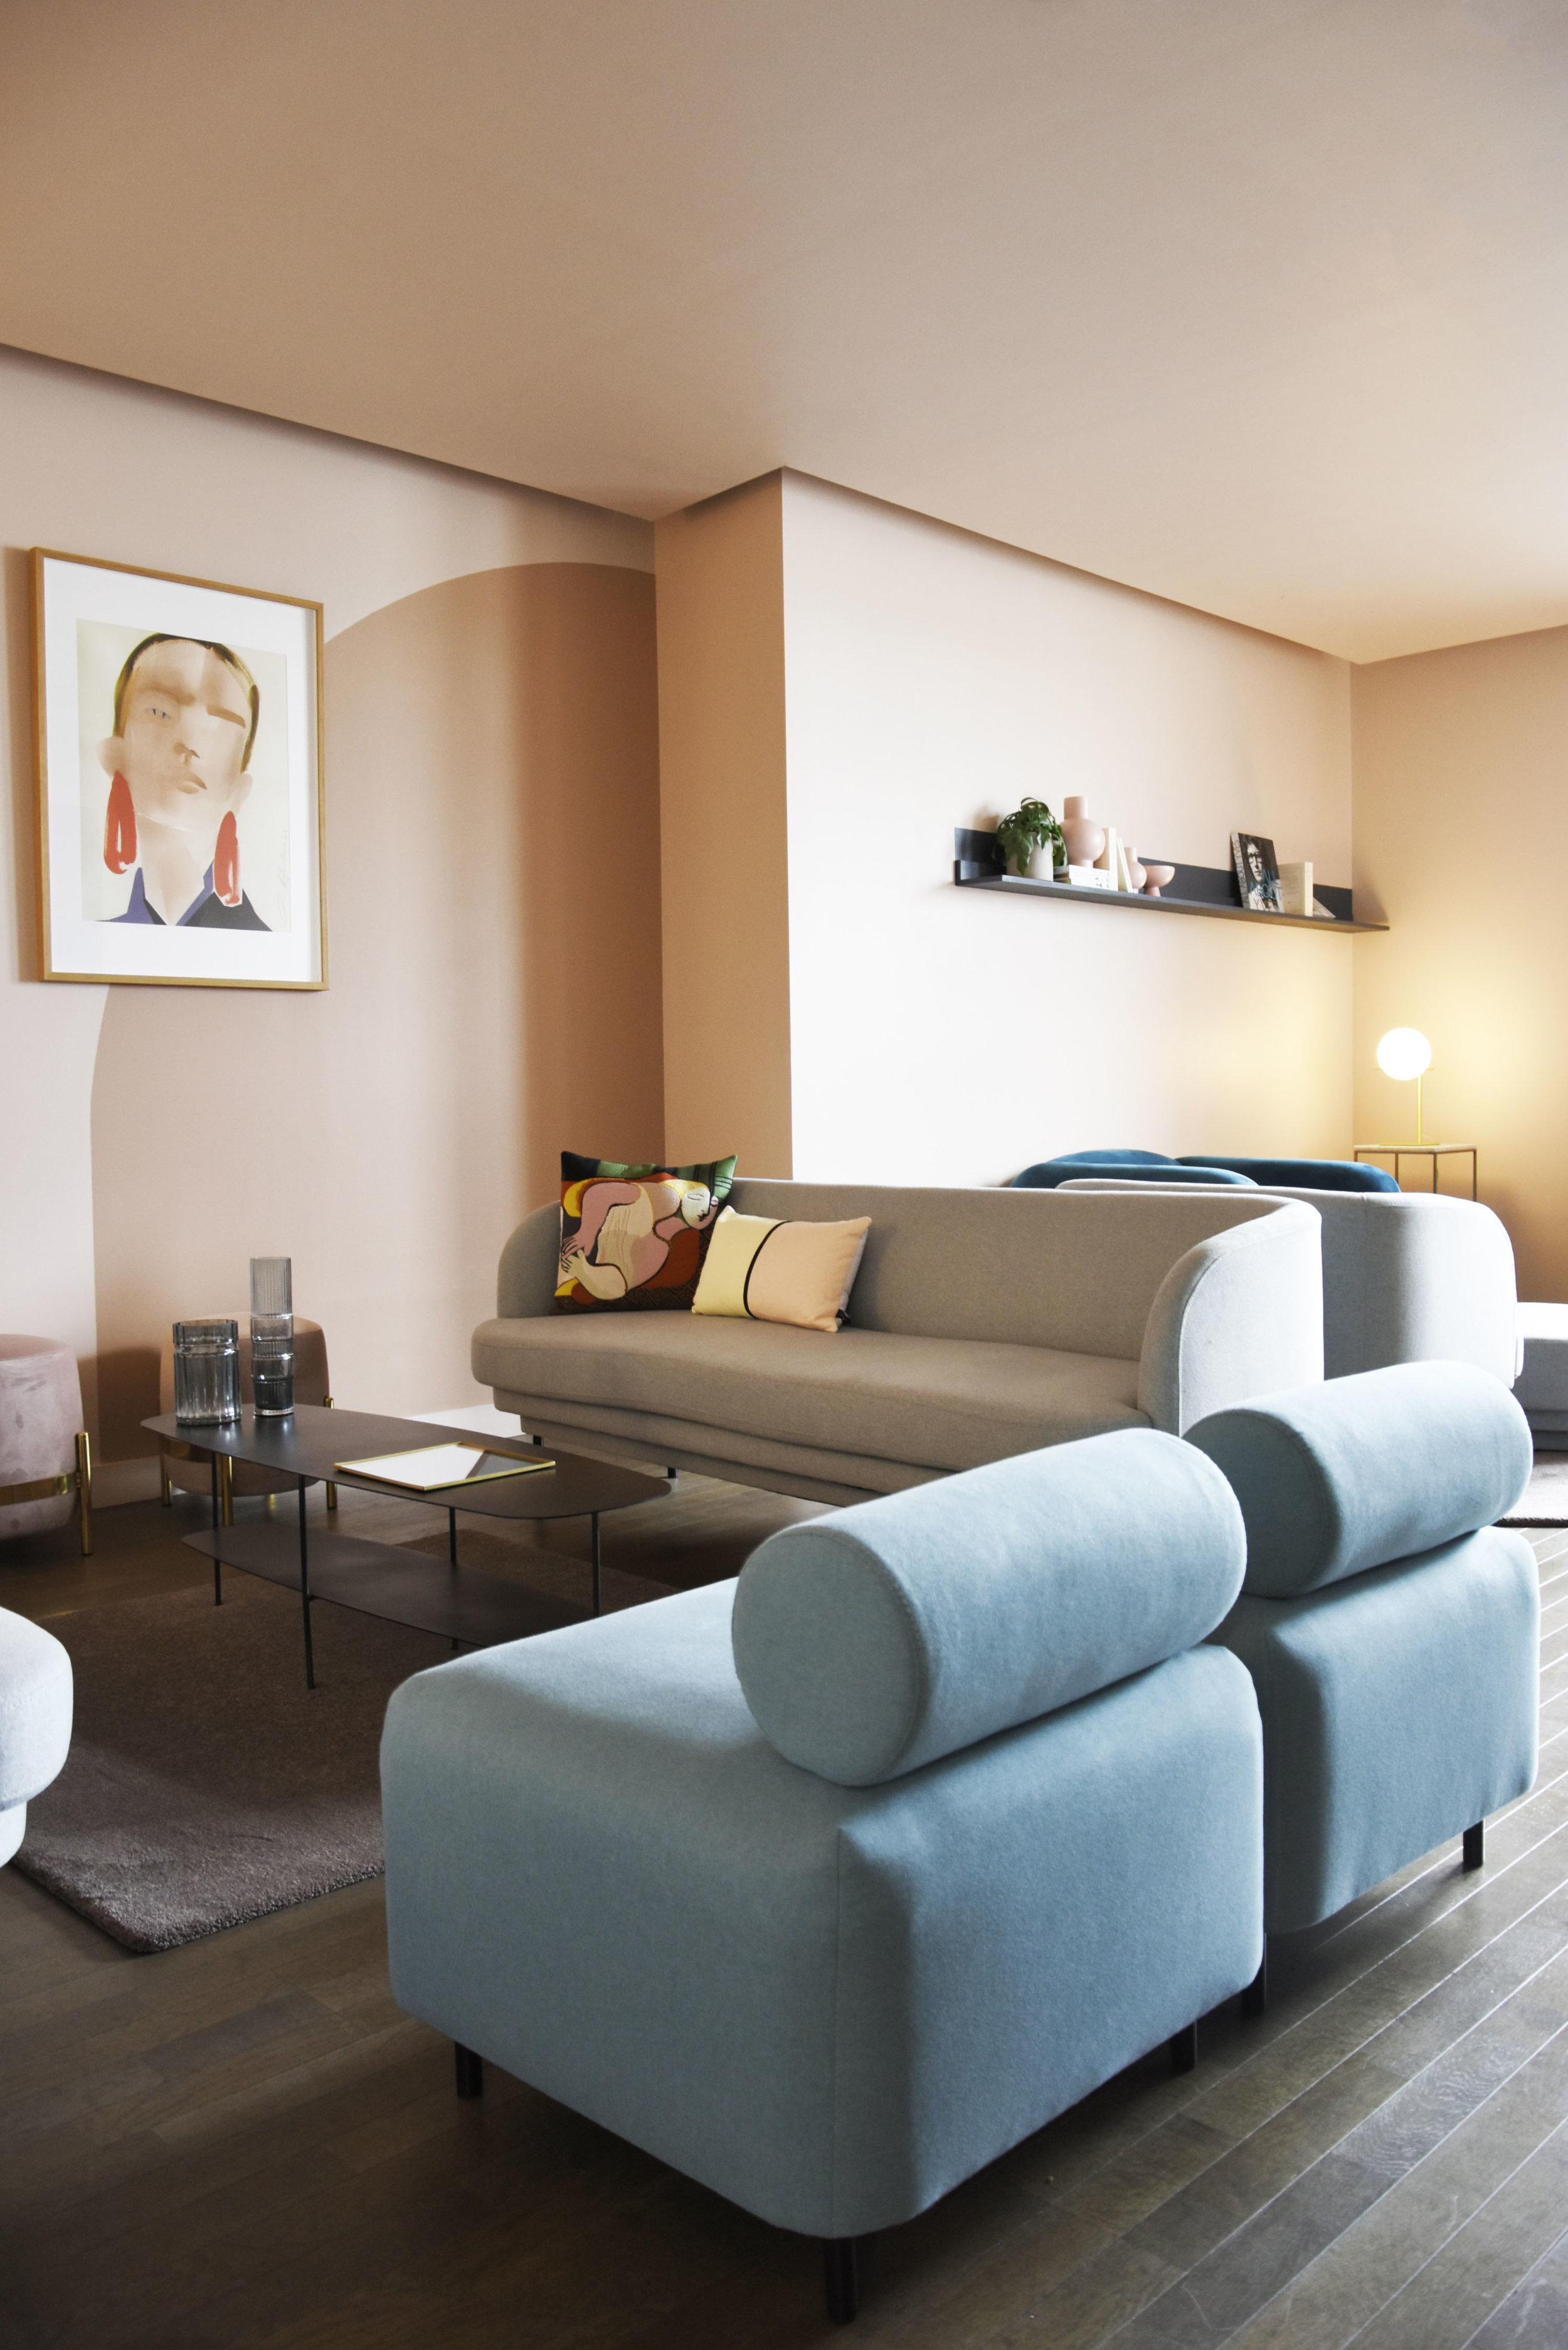 GALERIE LAFAYETTE espace client premium / BOVARI pouf, CORNICE sofa, GIN lamp, ONDIN vase, VEGA pouf